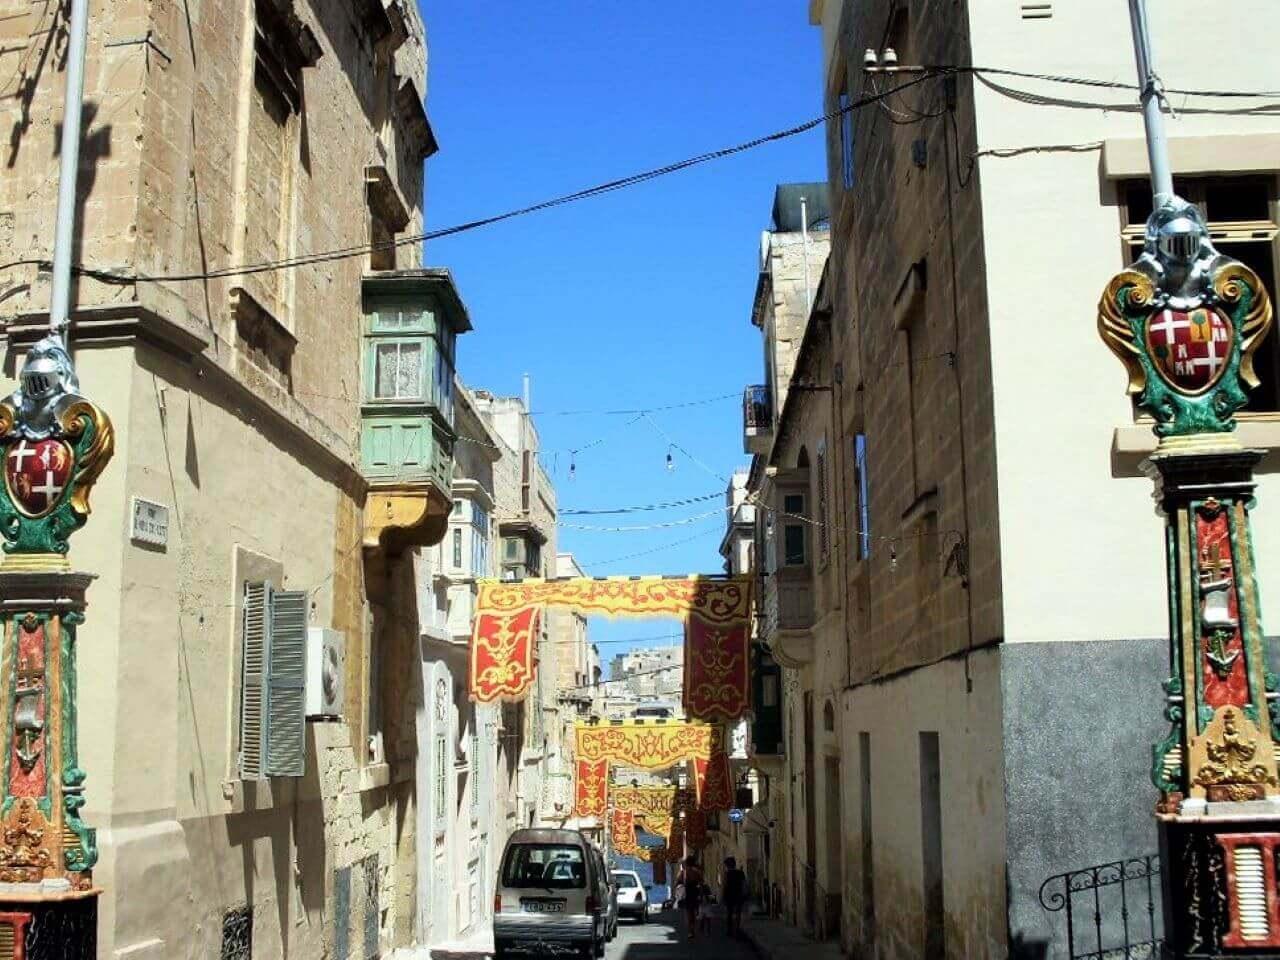 Decorated street, Senglea, Three cities, Tri grada, Malta